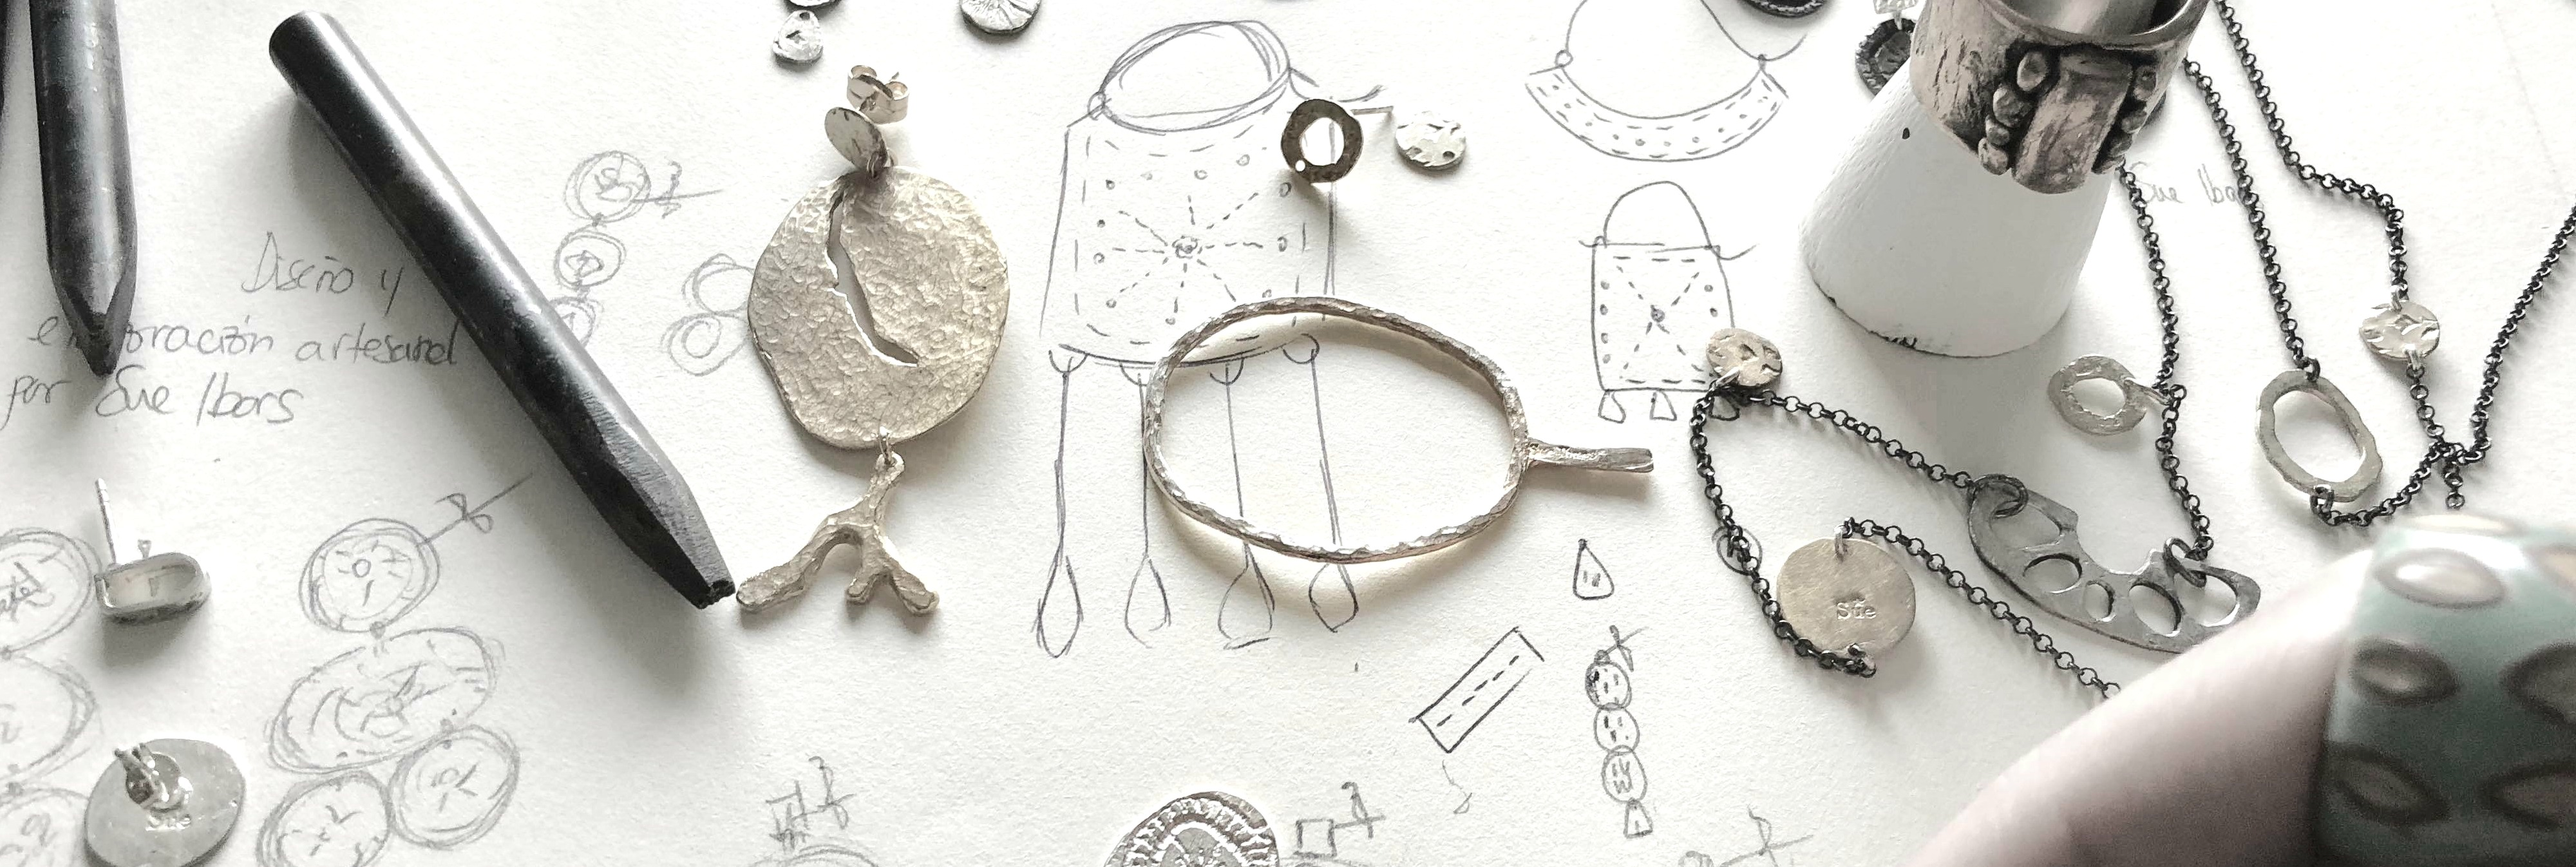 Joyas de plata fabricadas artesanalmente en españa